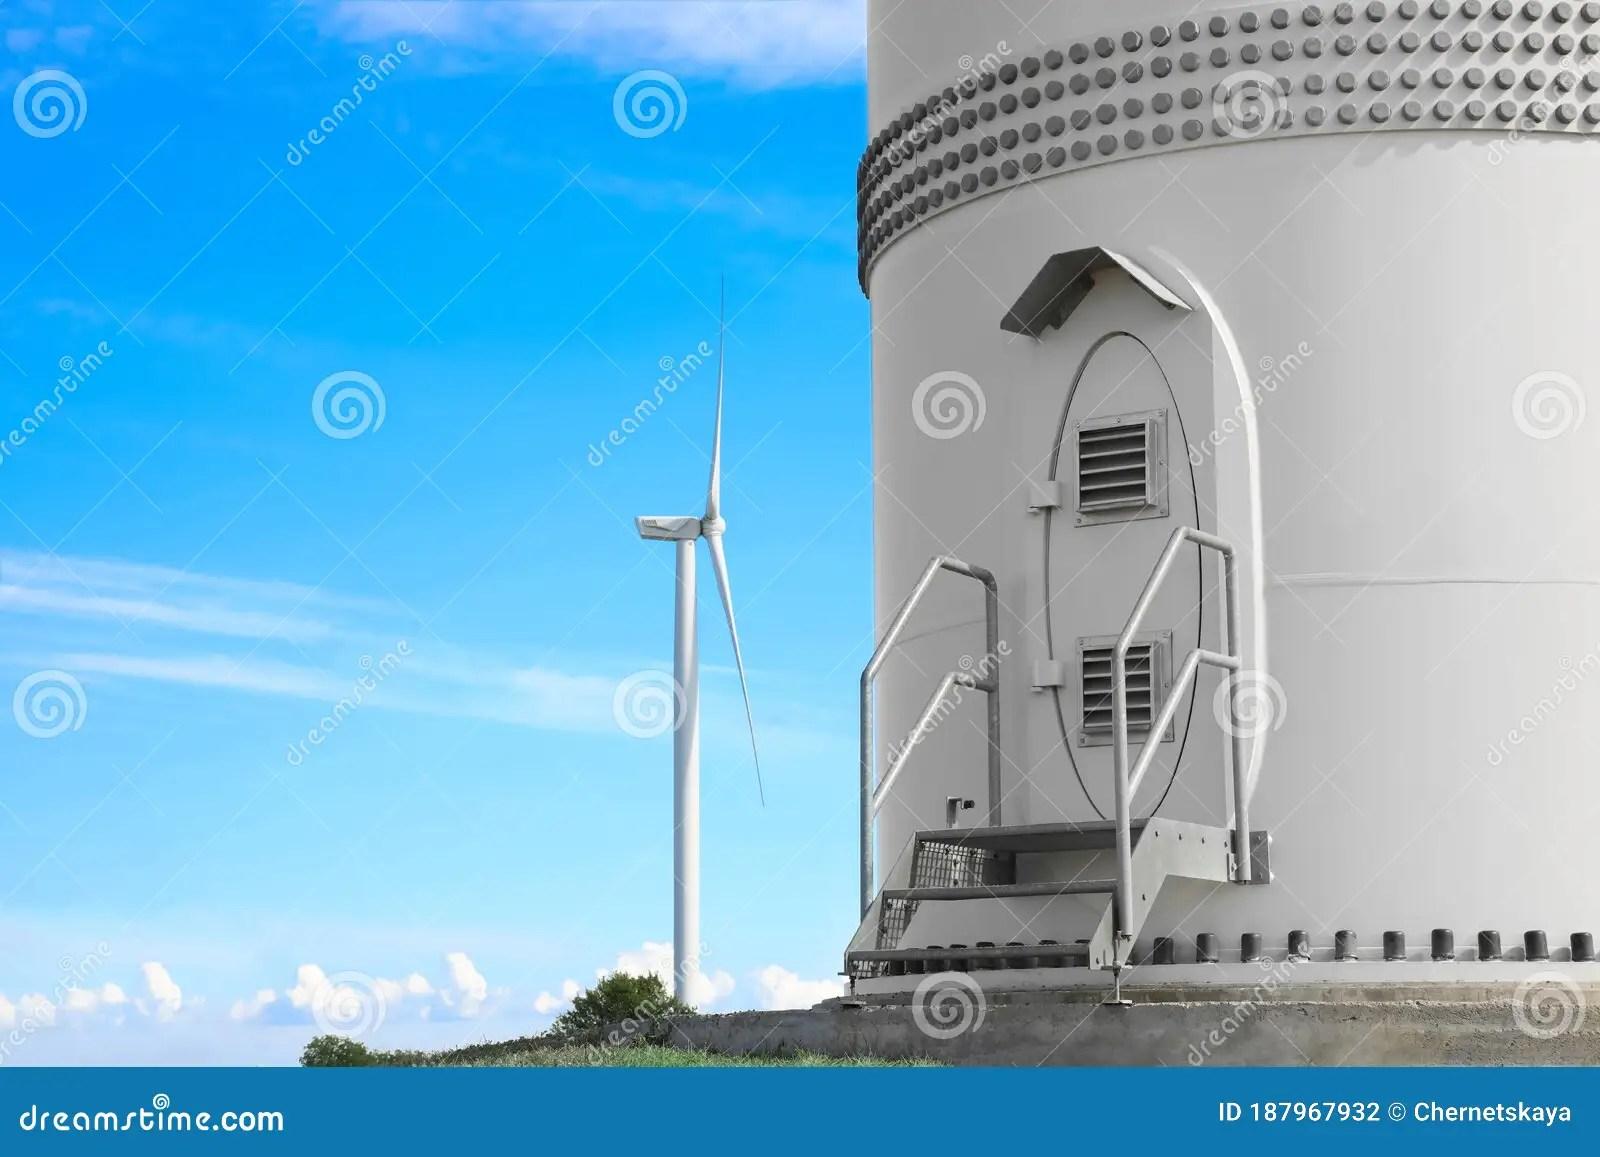 Entrance To Wind Turbine Power Generator Alternative